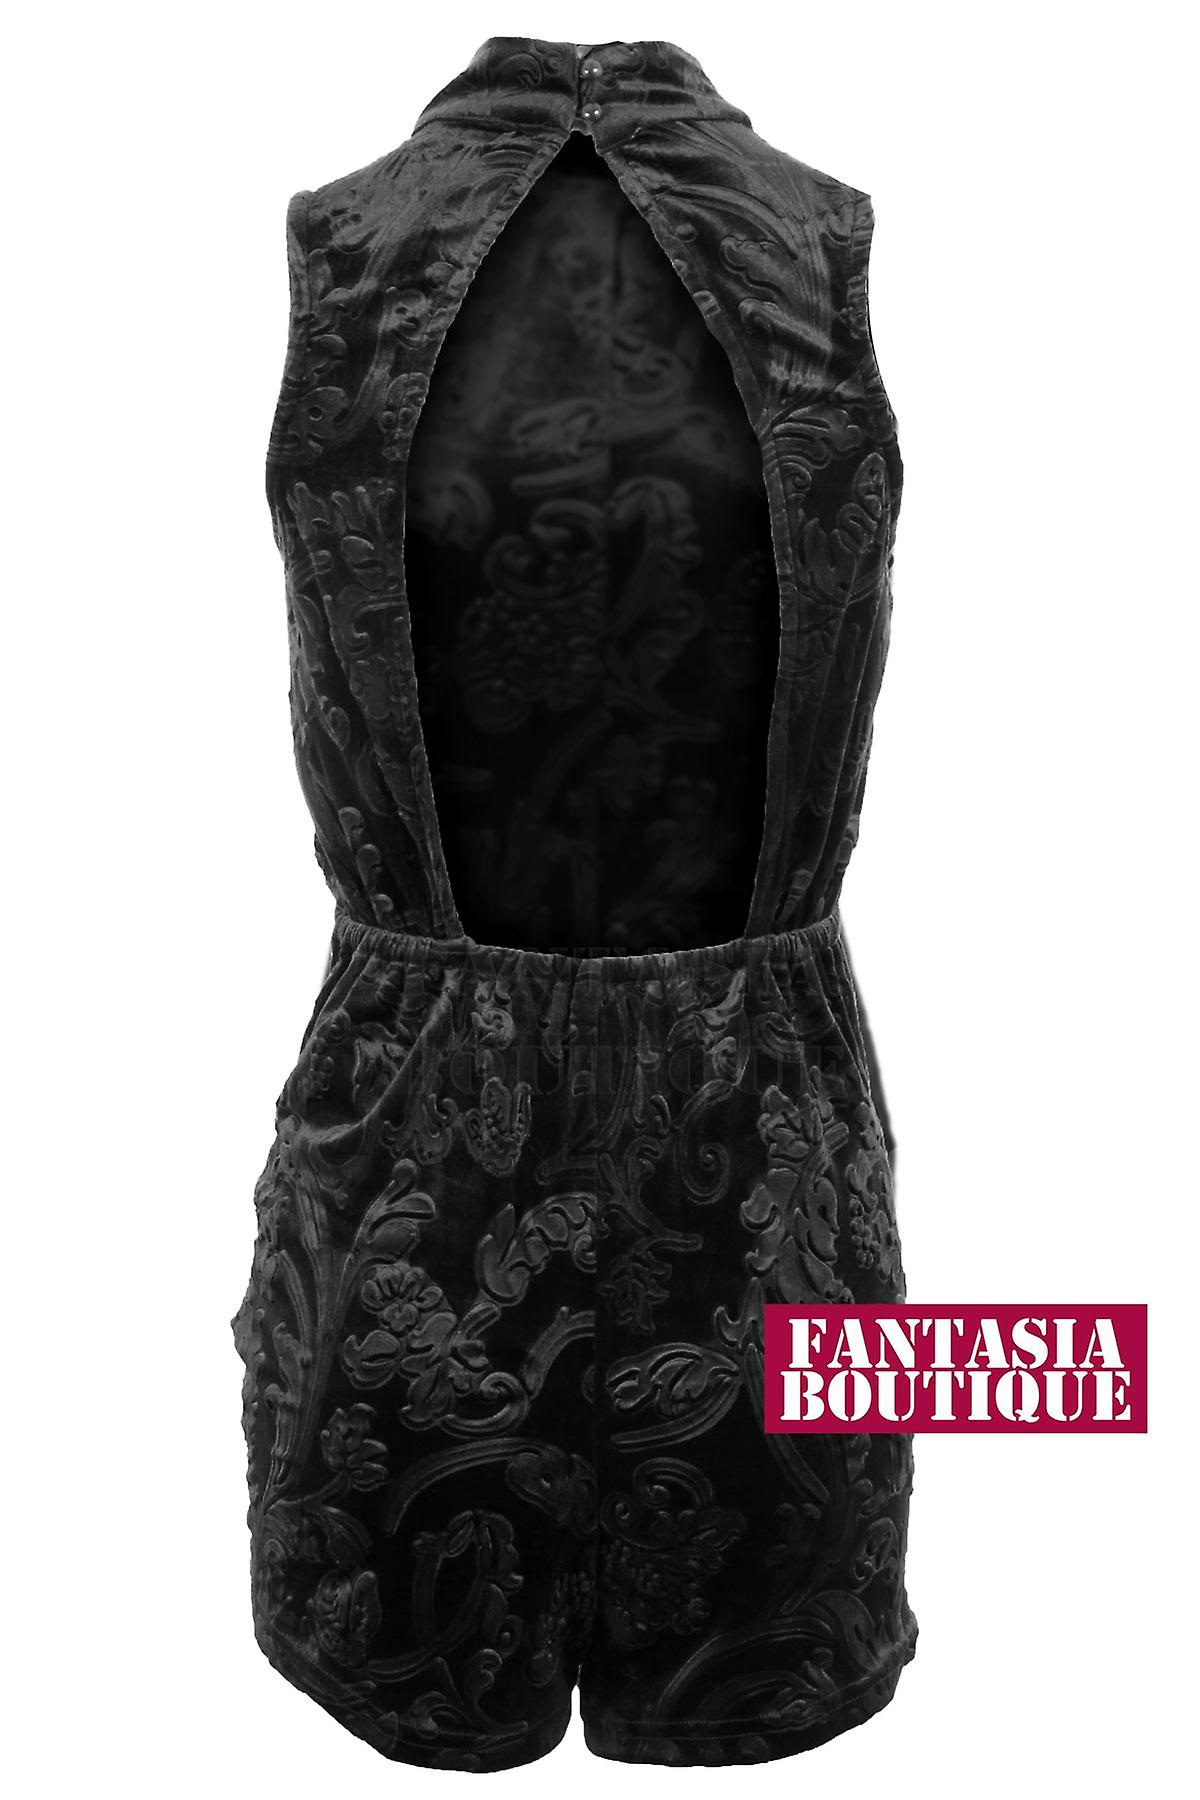 Ladies Paisley Open Back Buttoned Velvet Sleeveless Turtle Neck Women's Playsuit